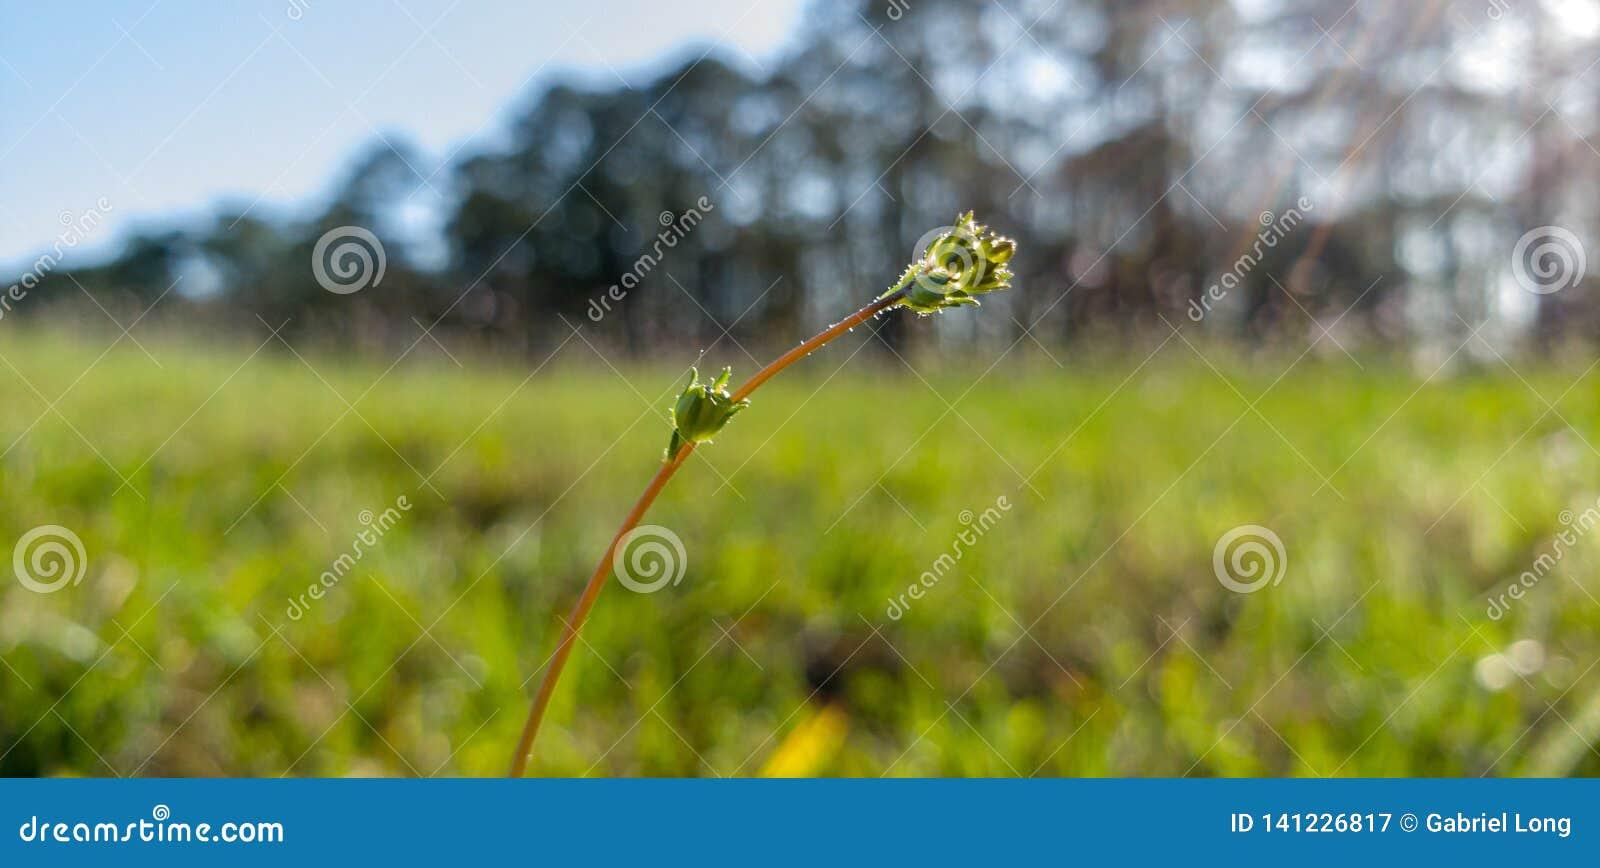 En ovanlig knopp som slår ut i en gräs- rund kulle